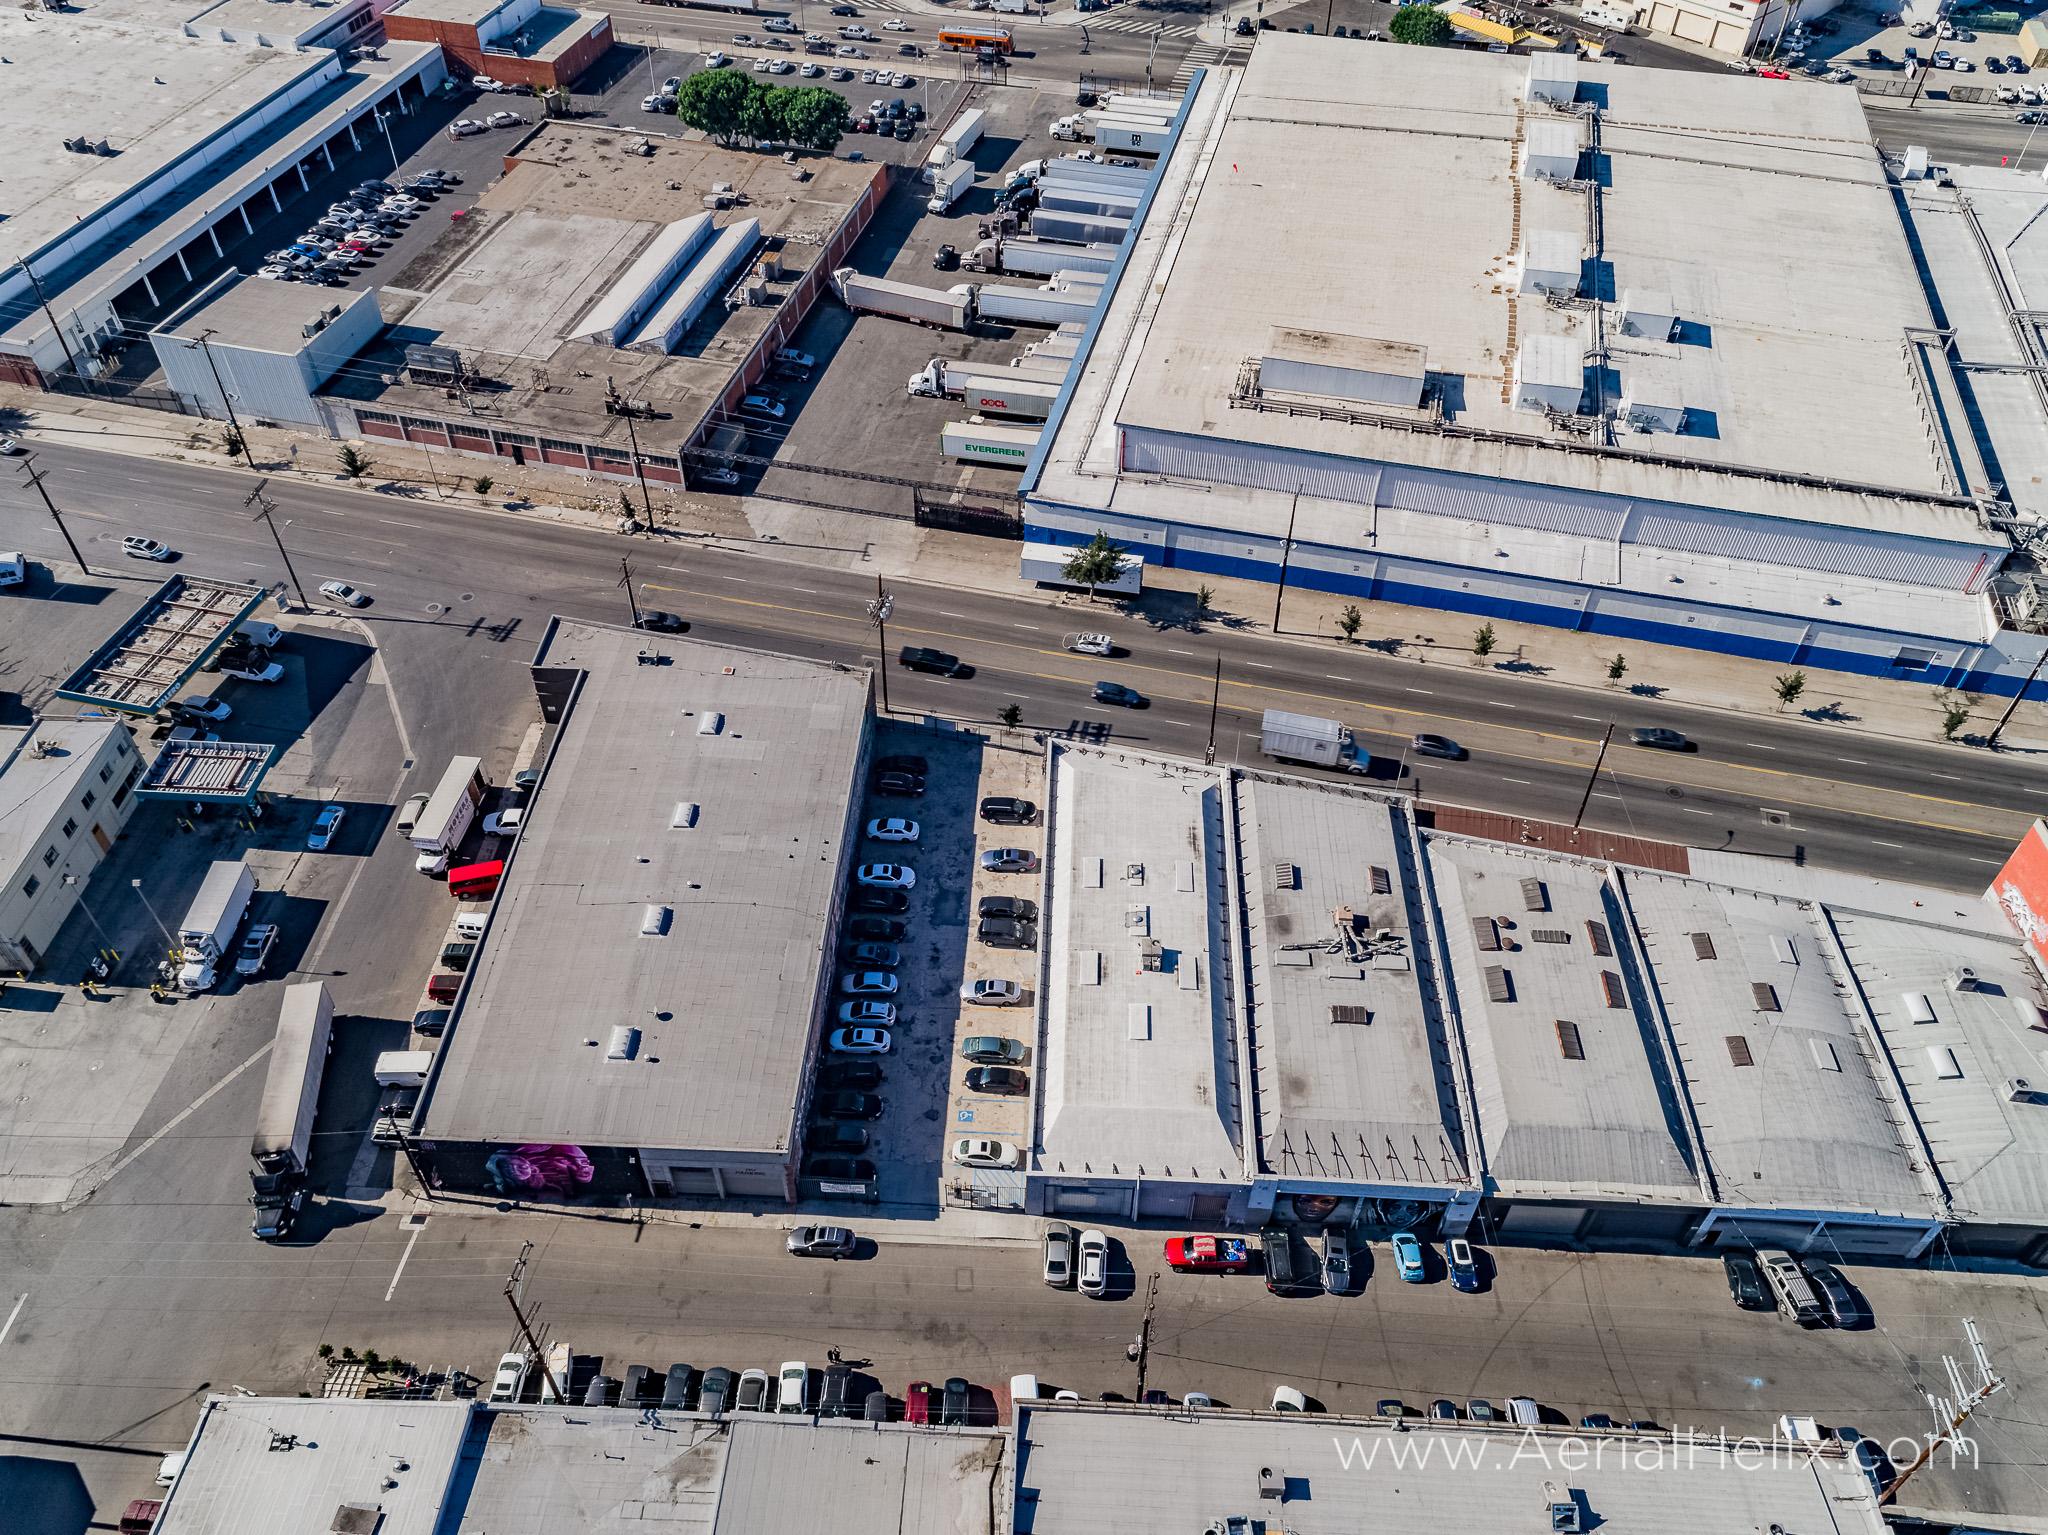 Perfect Parking 2 aerial photographer-14.jpg